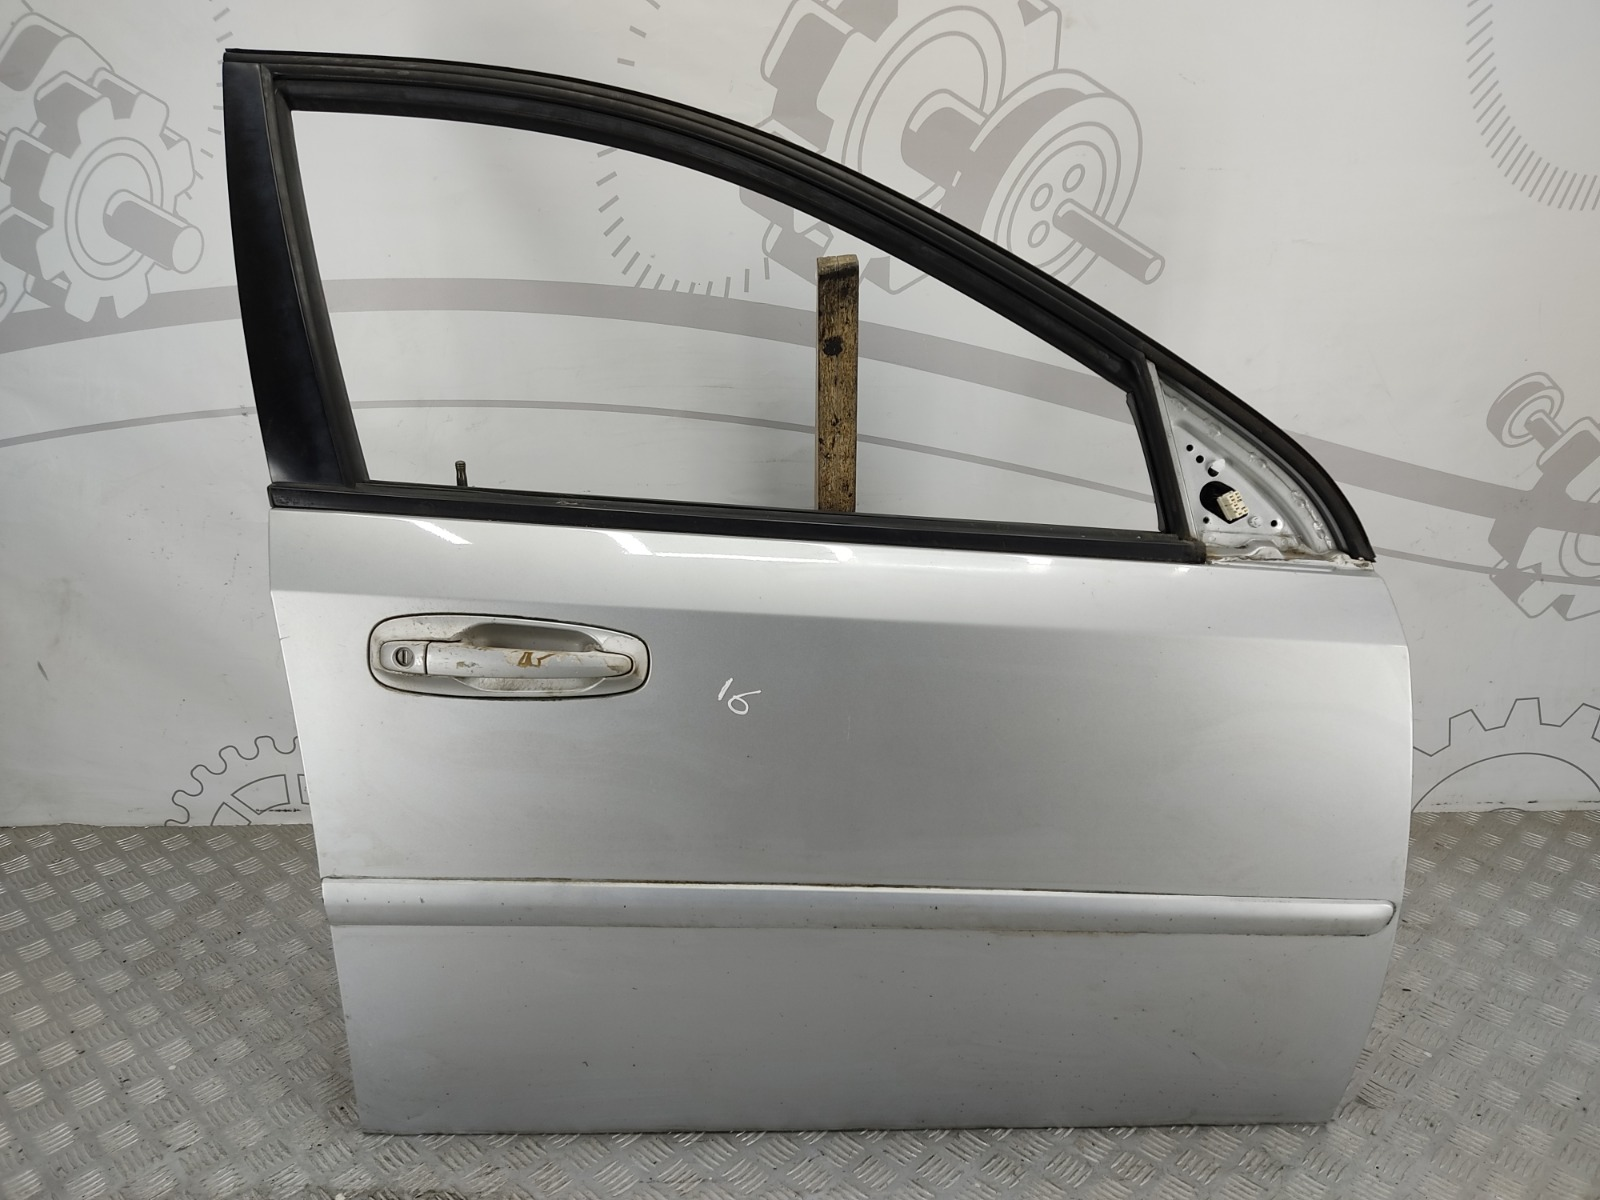 Дверь передняя правая Chevrolet Lacetti 1.6 I 2007 (б/у)